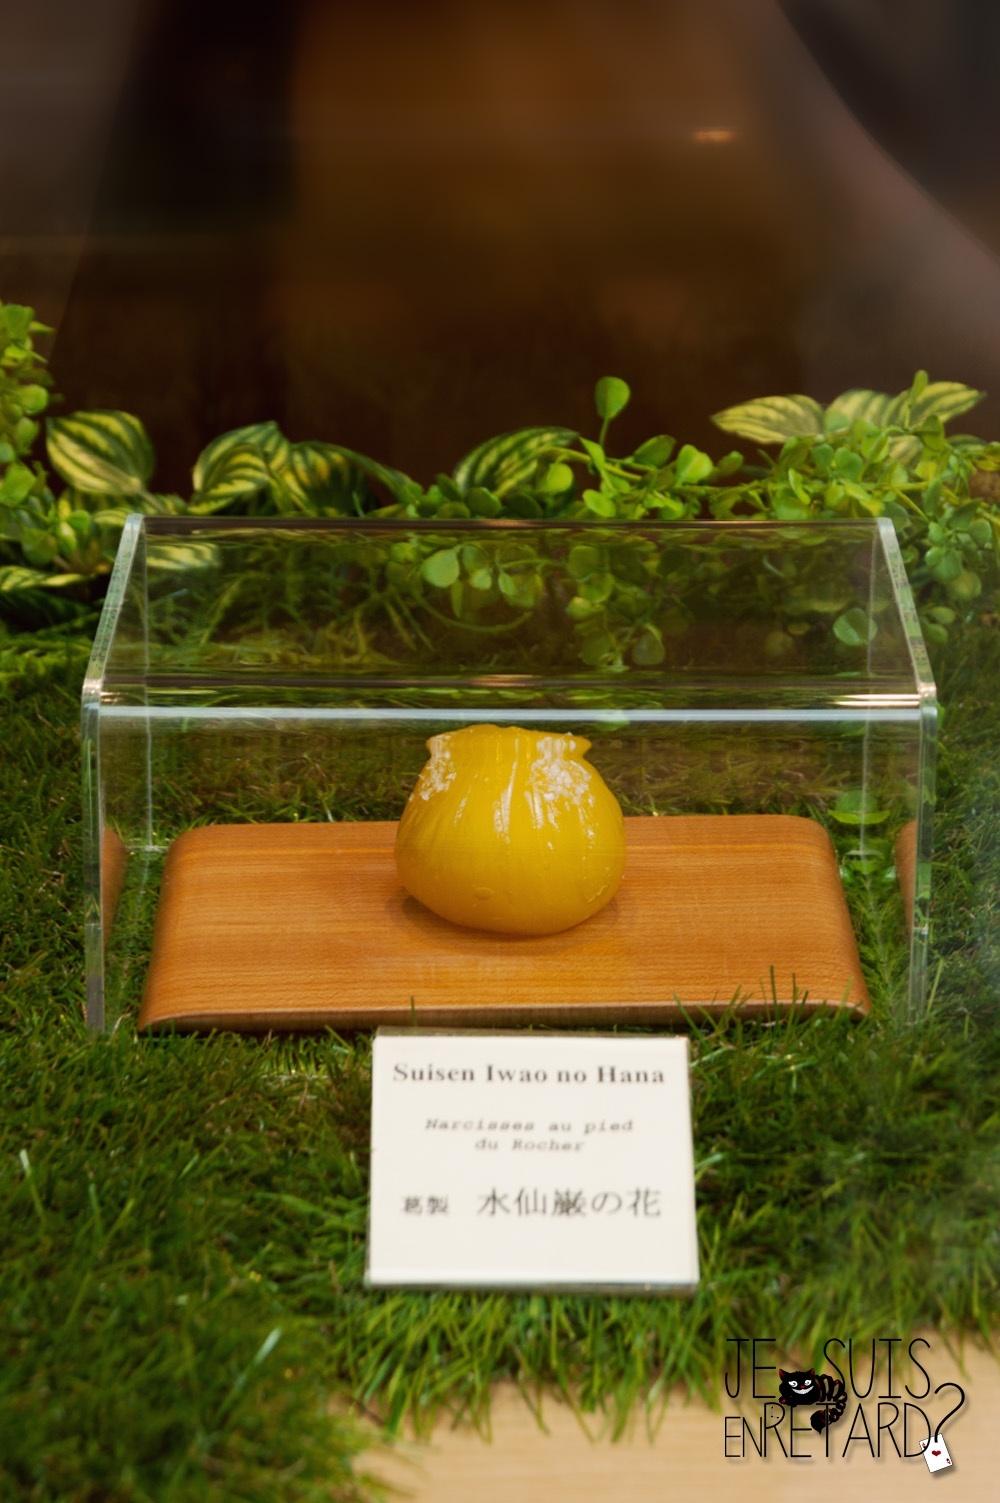 Toraya 7 - Pâtisserie japonaise - pintrerest